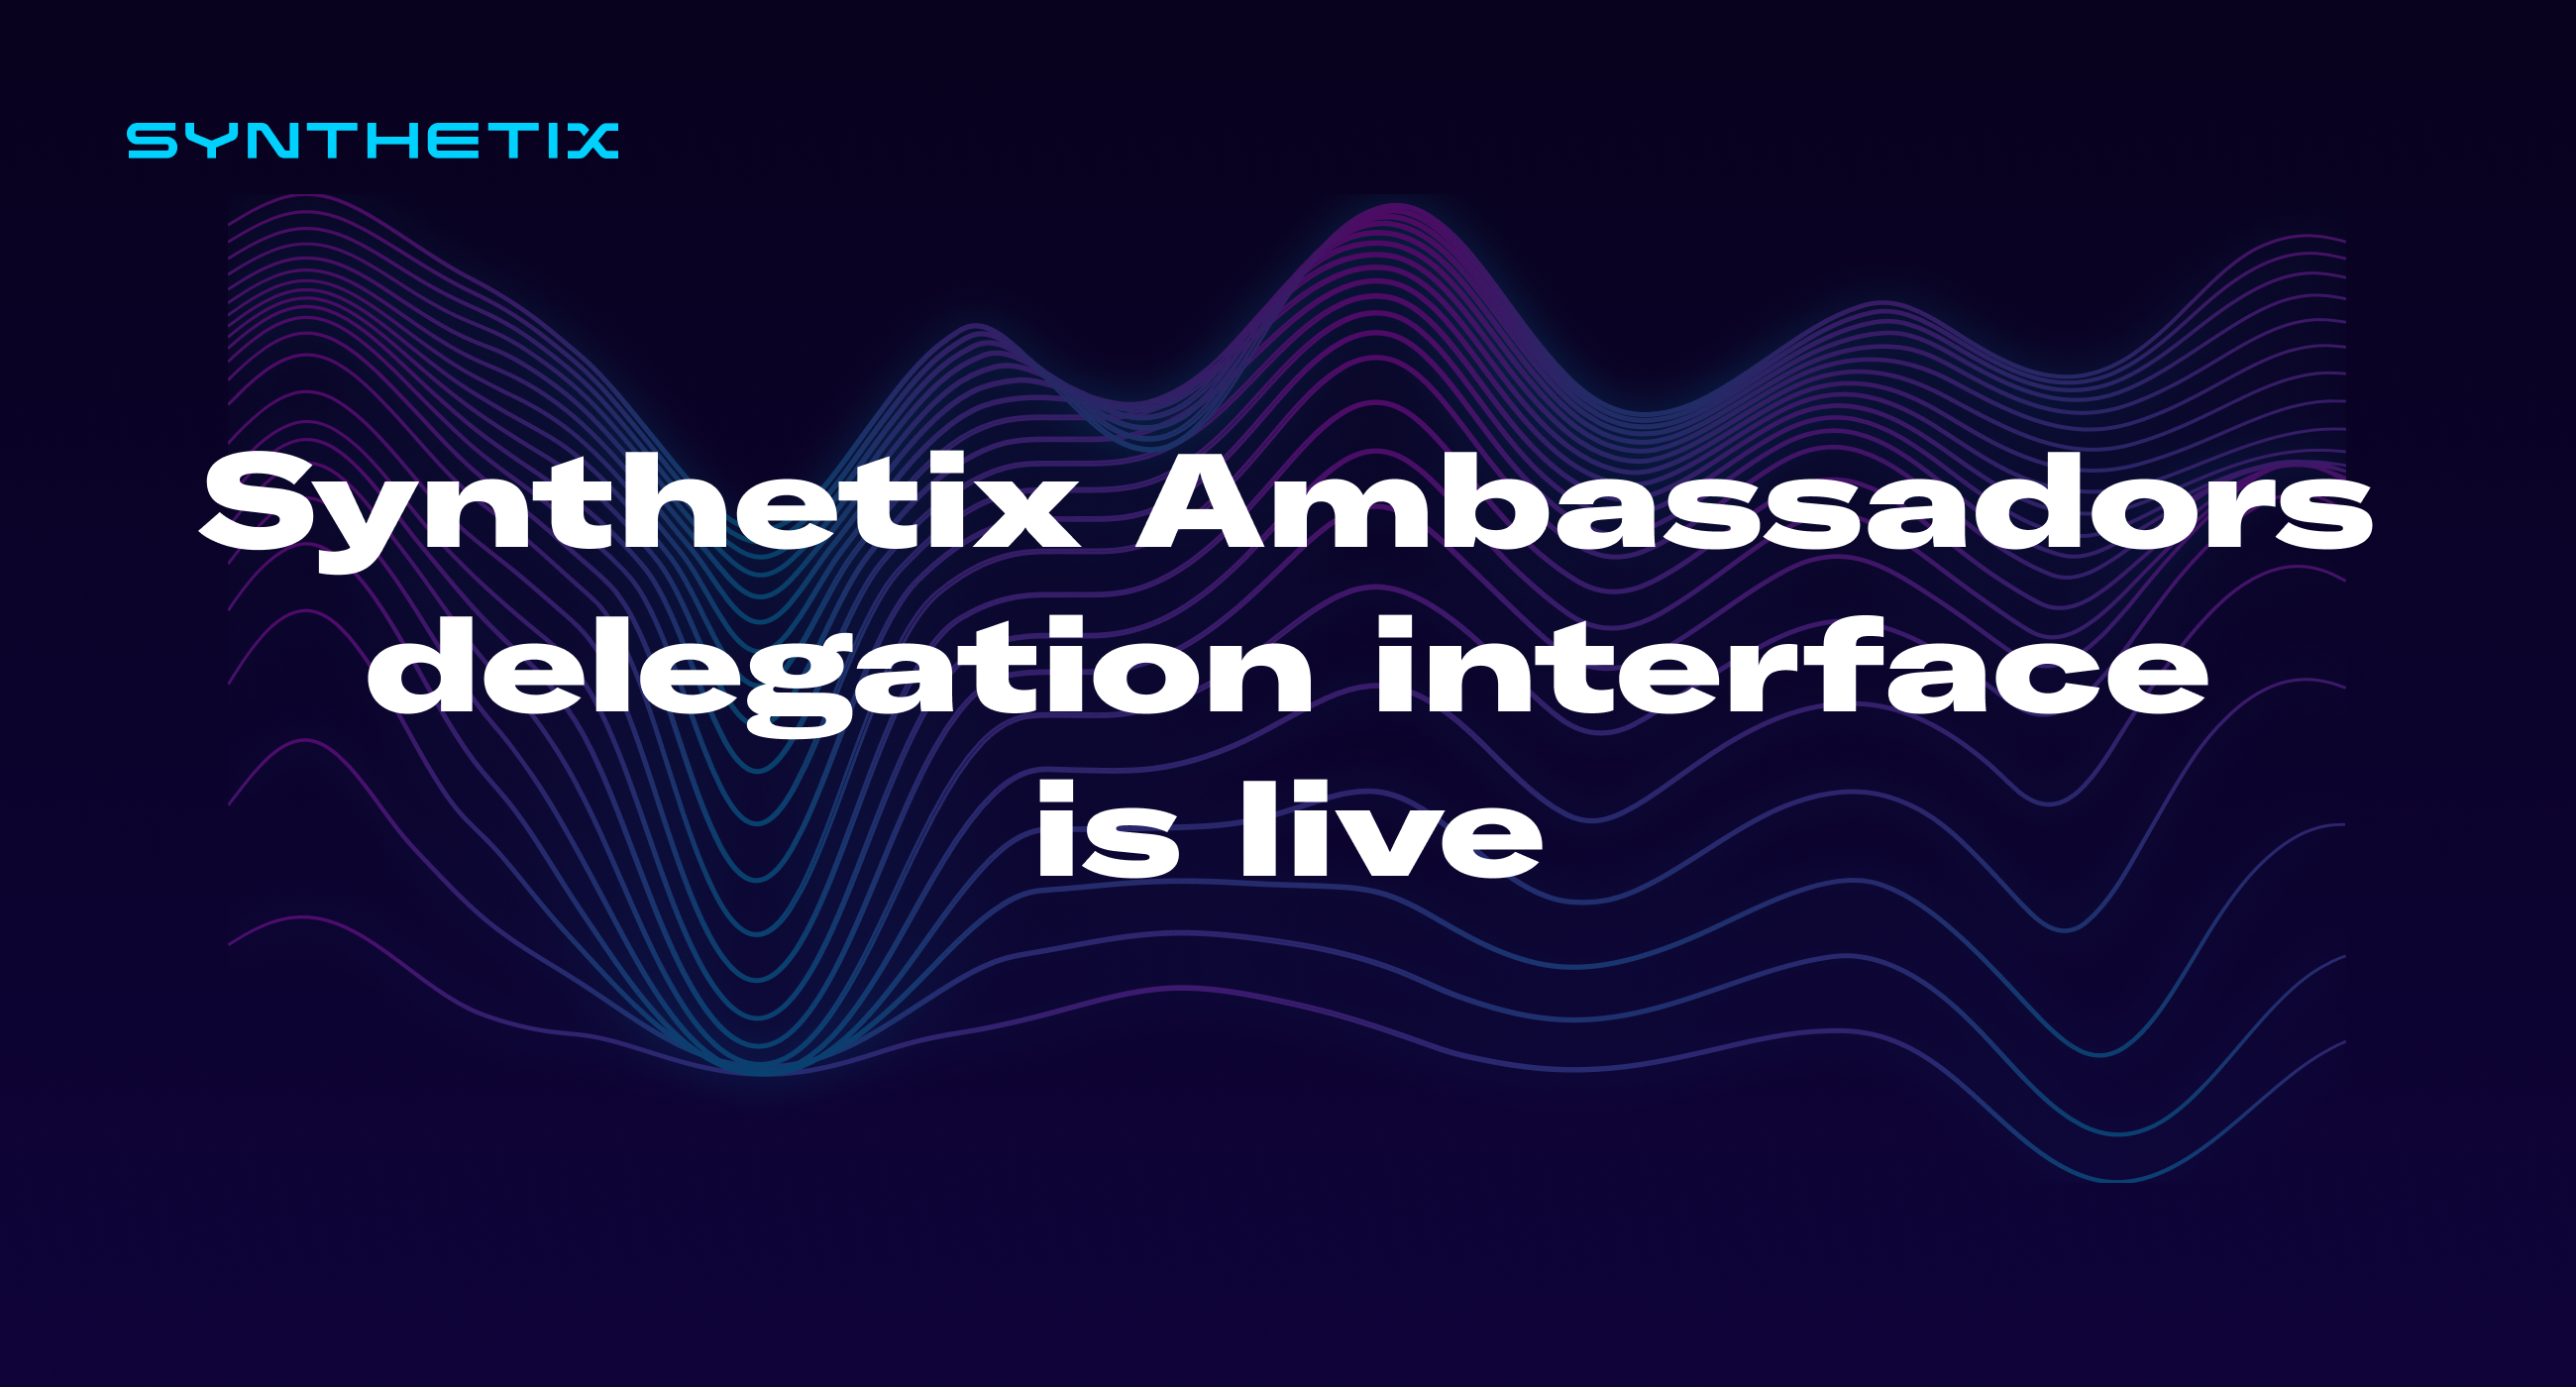 The Synthetix Ambassadors governance portal is now live!